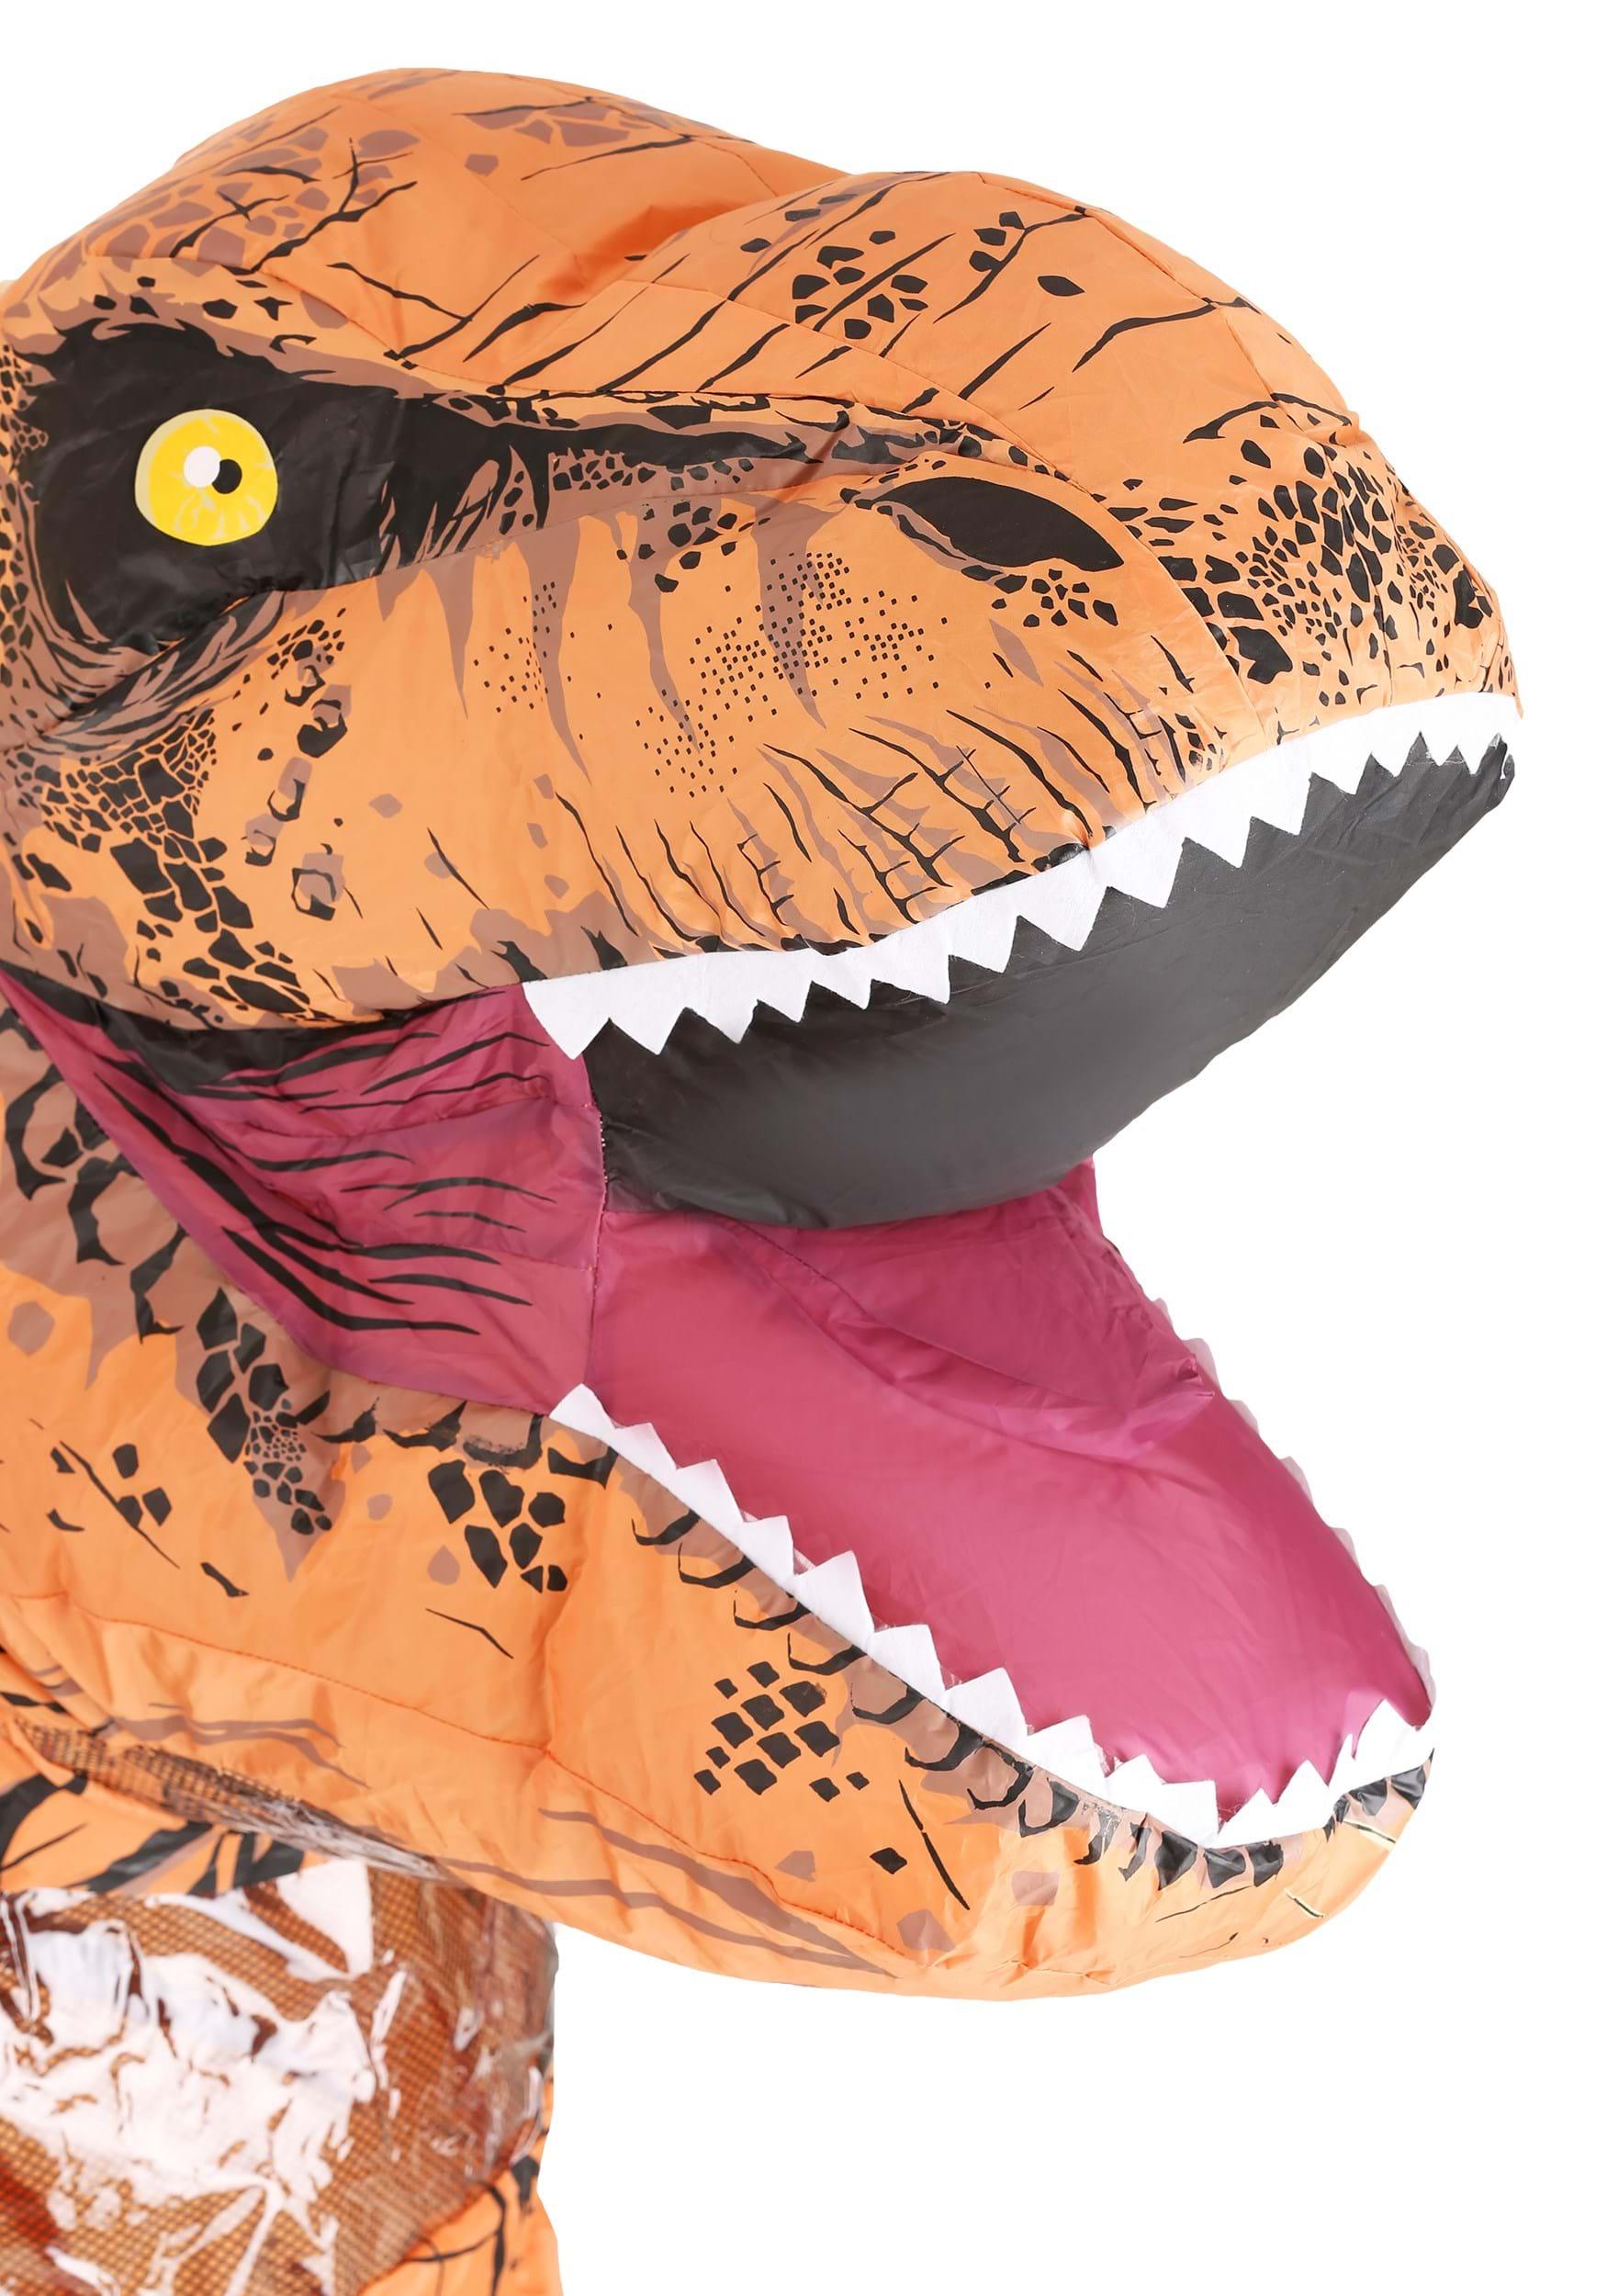 Adult Inflatable Jurassic World T Rex Costume